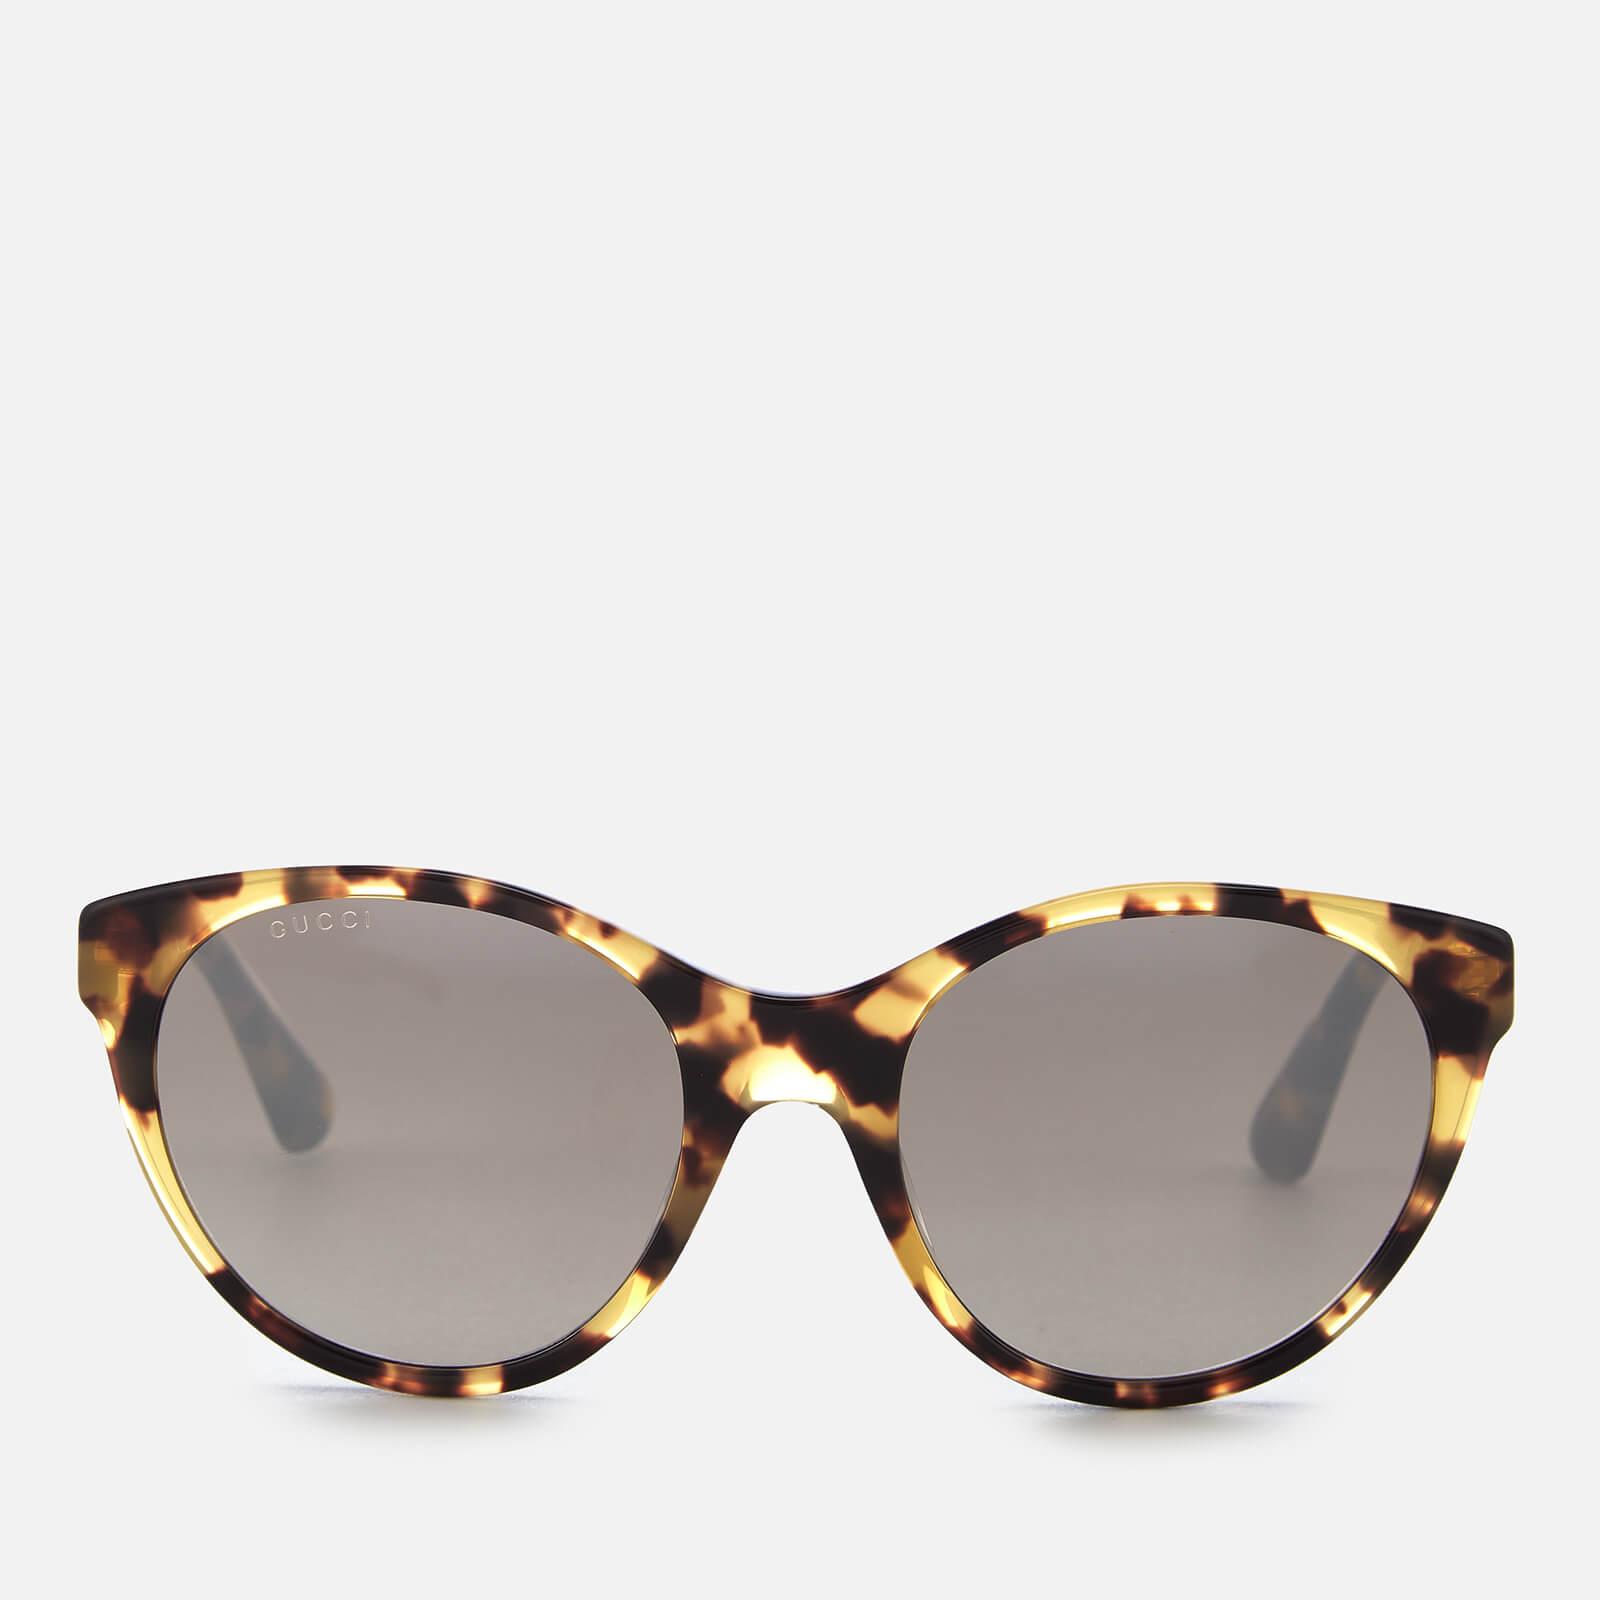 8e4110b038 Gucci Women s Oval Tortoiseshell Sunglasses - Brown - Free UK Delivery over  £50